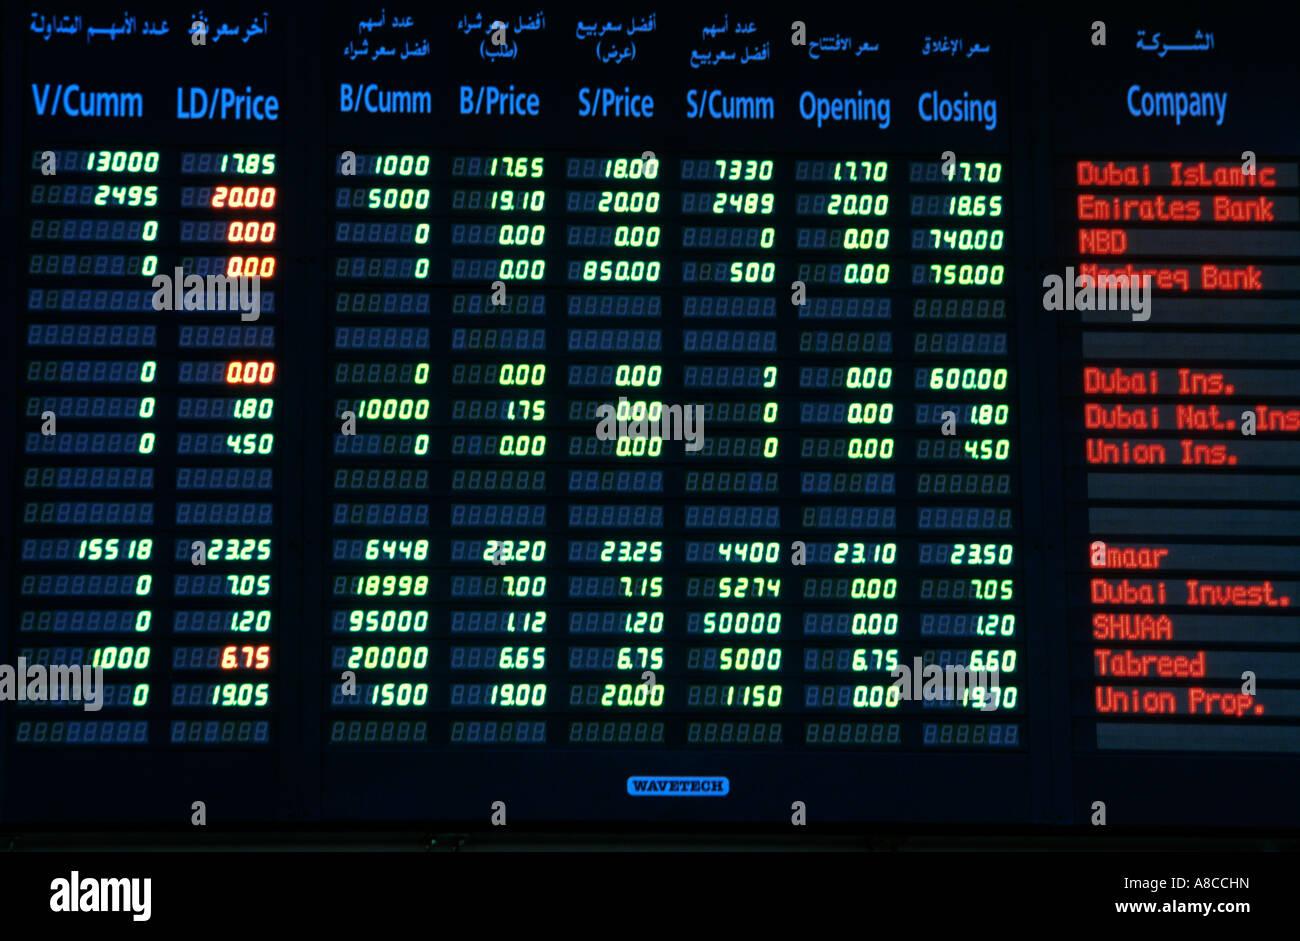 Share Trading Screens Financial Market Dubai UAE Stock Photo